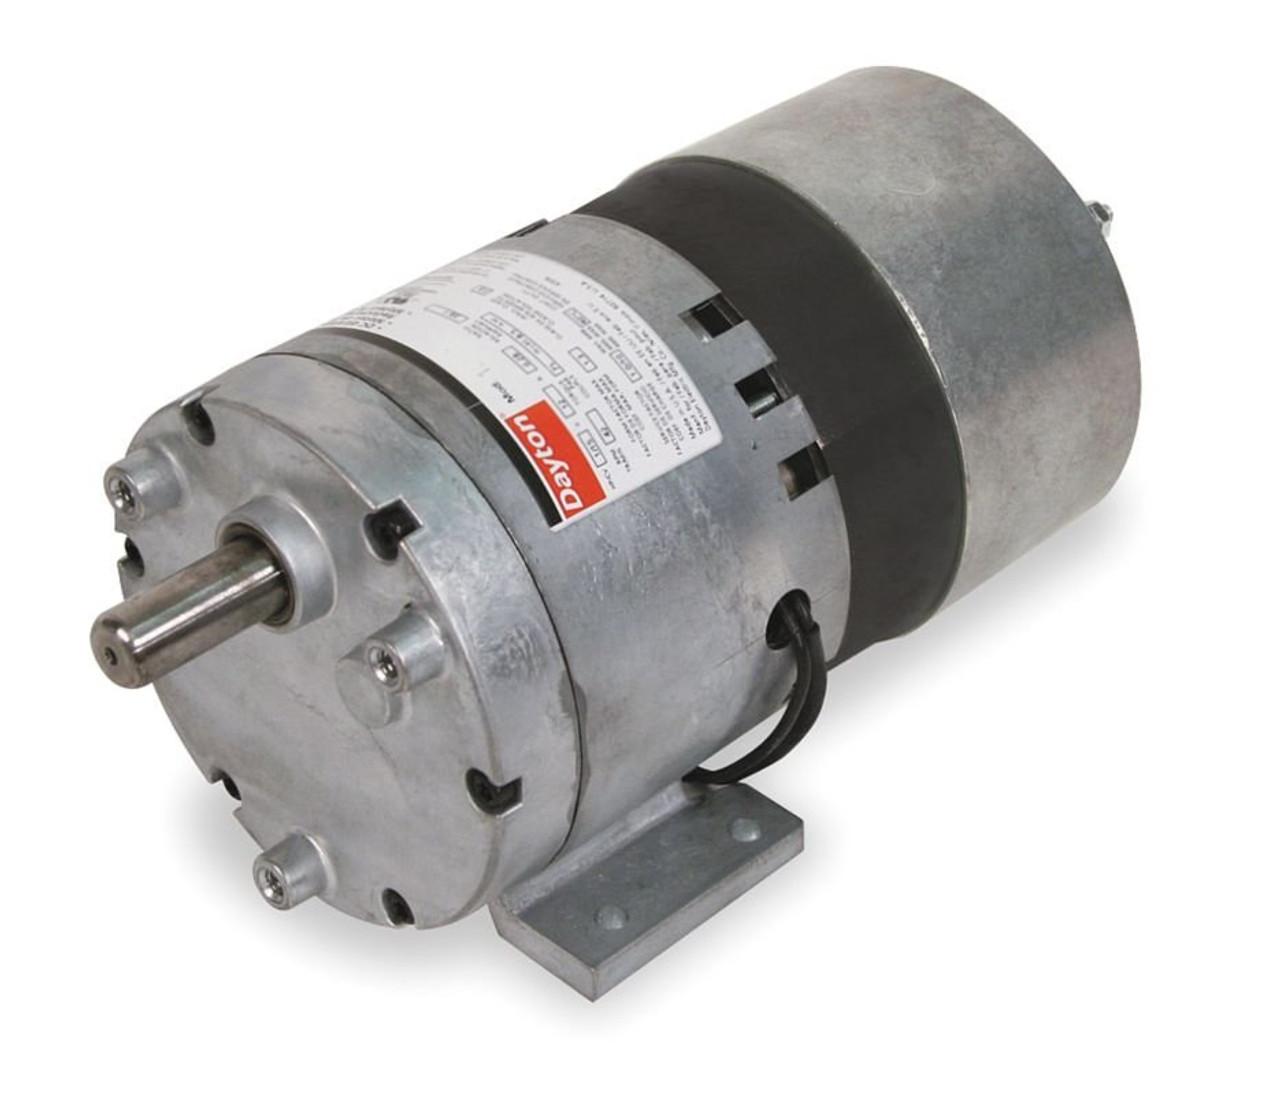 dayton model 1lpl6 gear motor 60 rpm 1 10 hp 115v 3m138 on 76 ly dayton gear motor wiring diagram  [ 1280 x 1095 Pixel ]